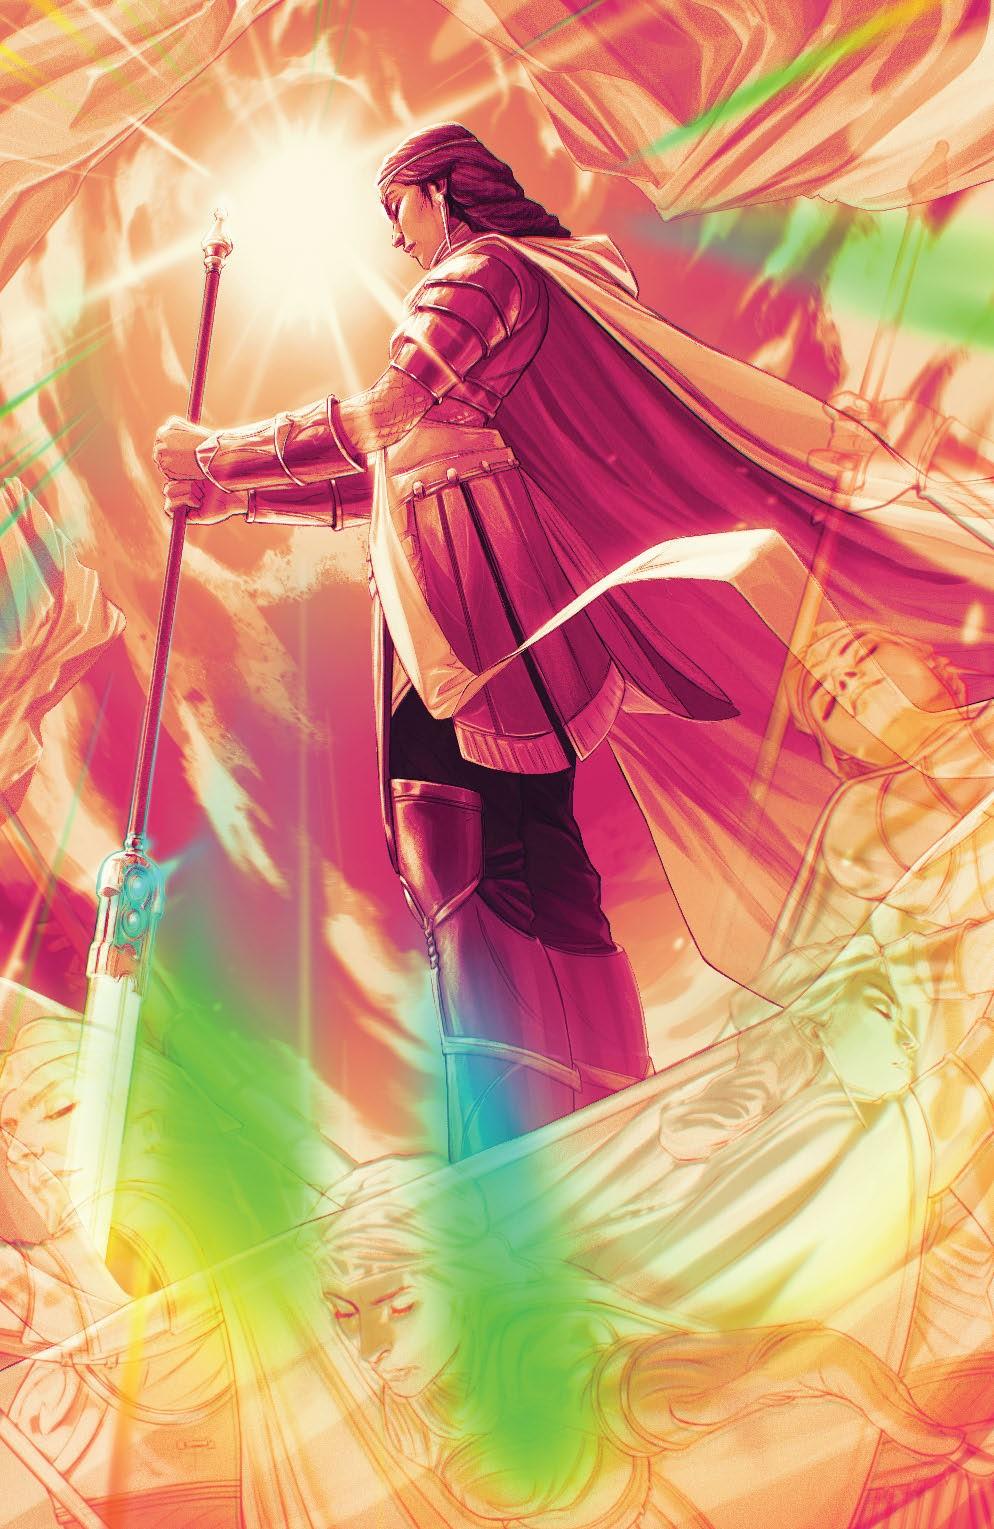 Magic_005_Cover_B2_Planeswalker ComicList: BOOM! Studios New Releases for 08/04/2021